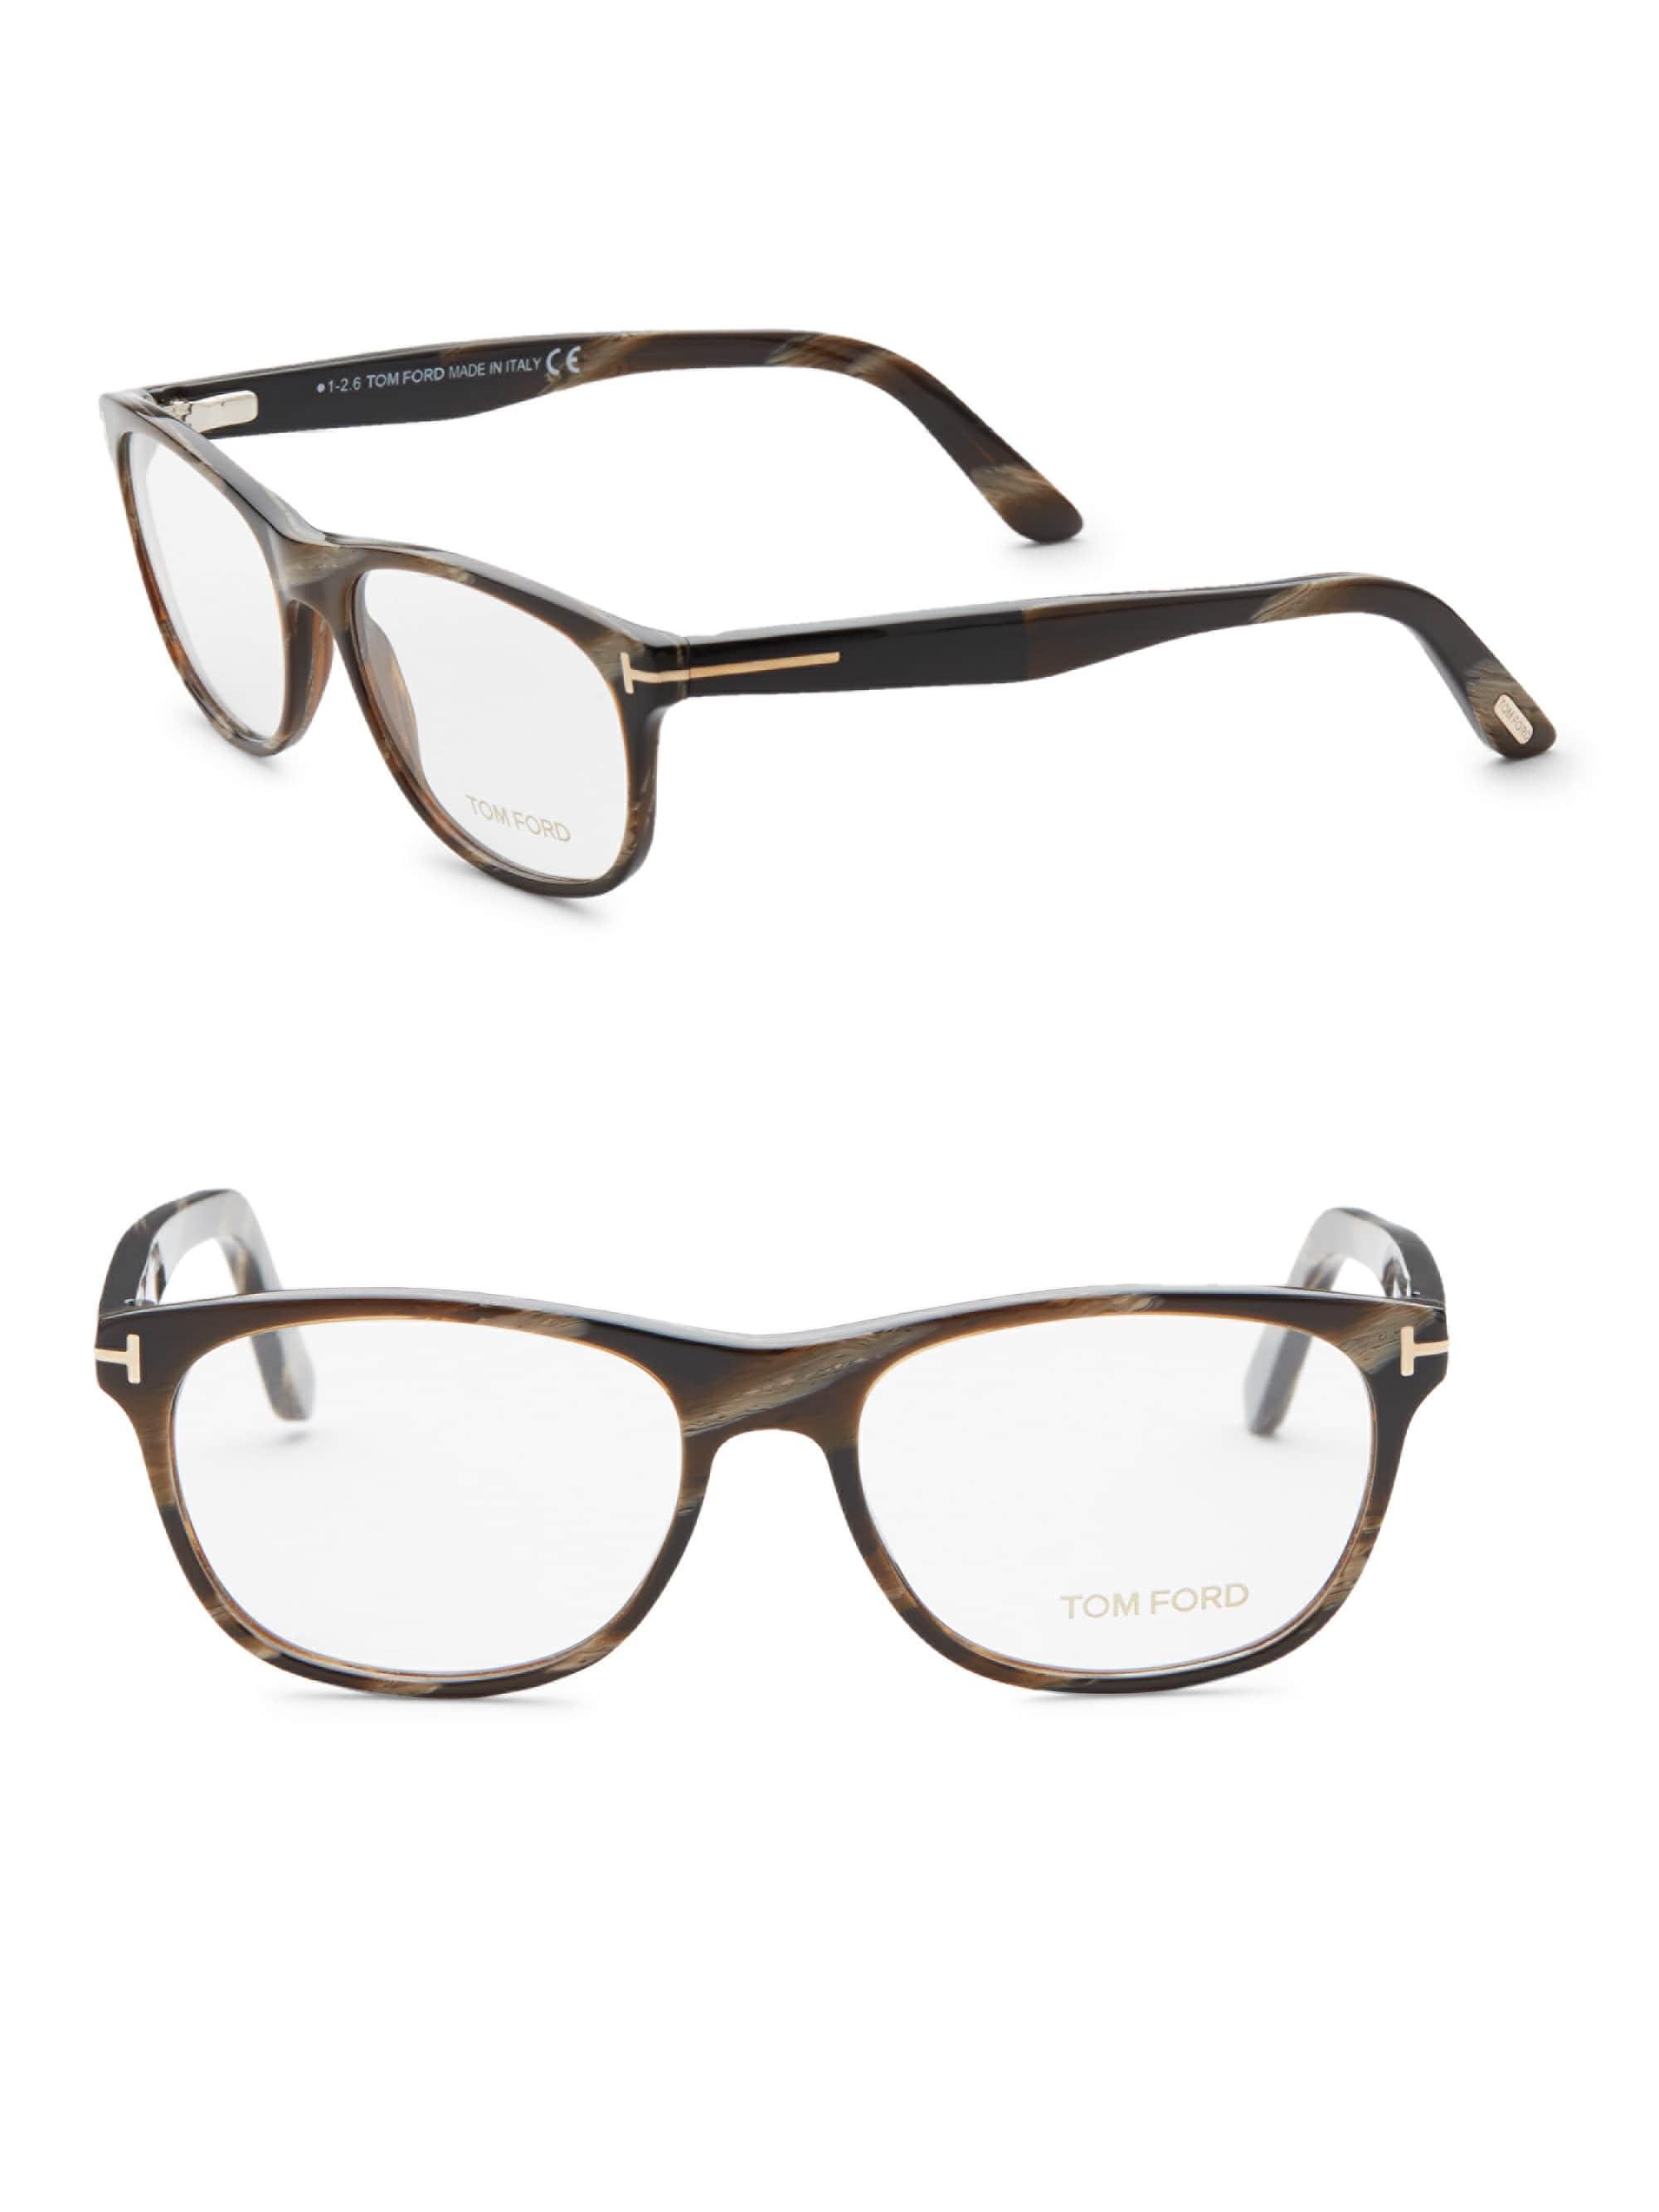 816a3bec40 Tom Ford Men s 50mm Optical Glasses - Brown in Brown for Men - Lyst